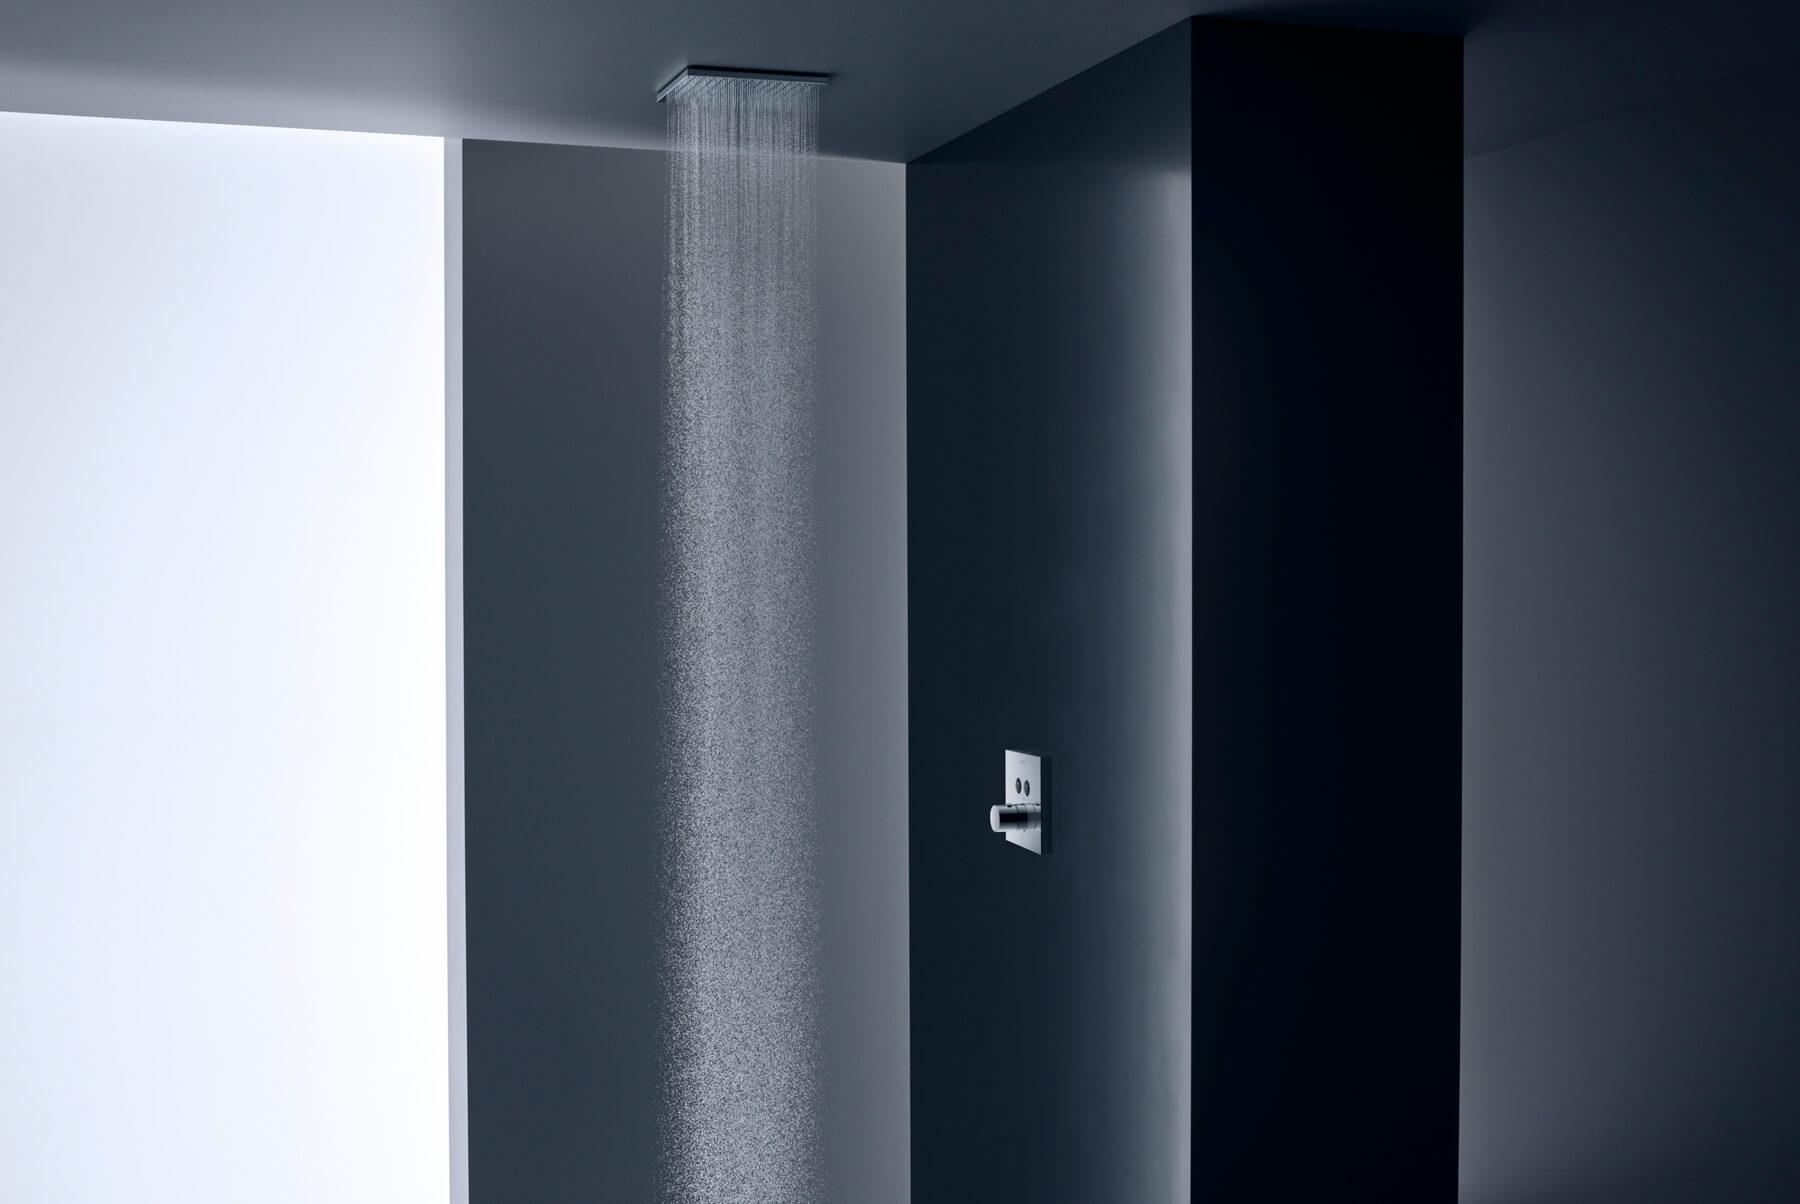 Brassware-AXOR-SHOWER-SELECT-INSET-1-1800x1204